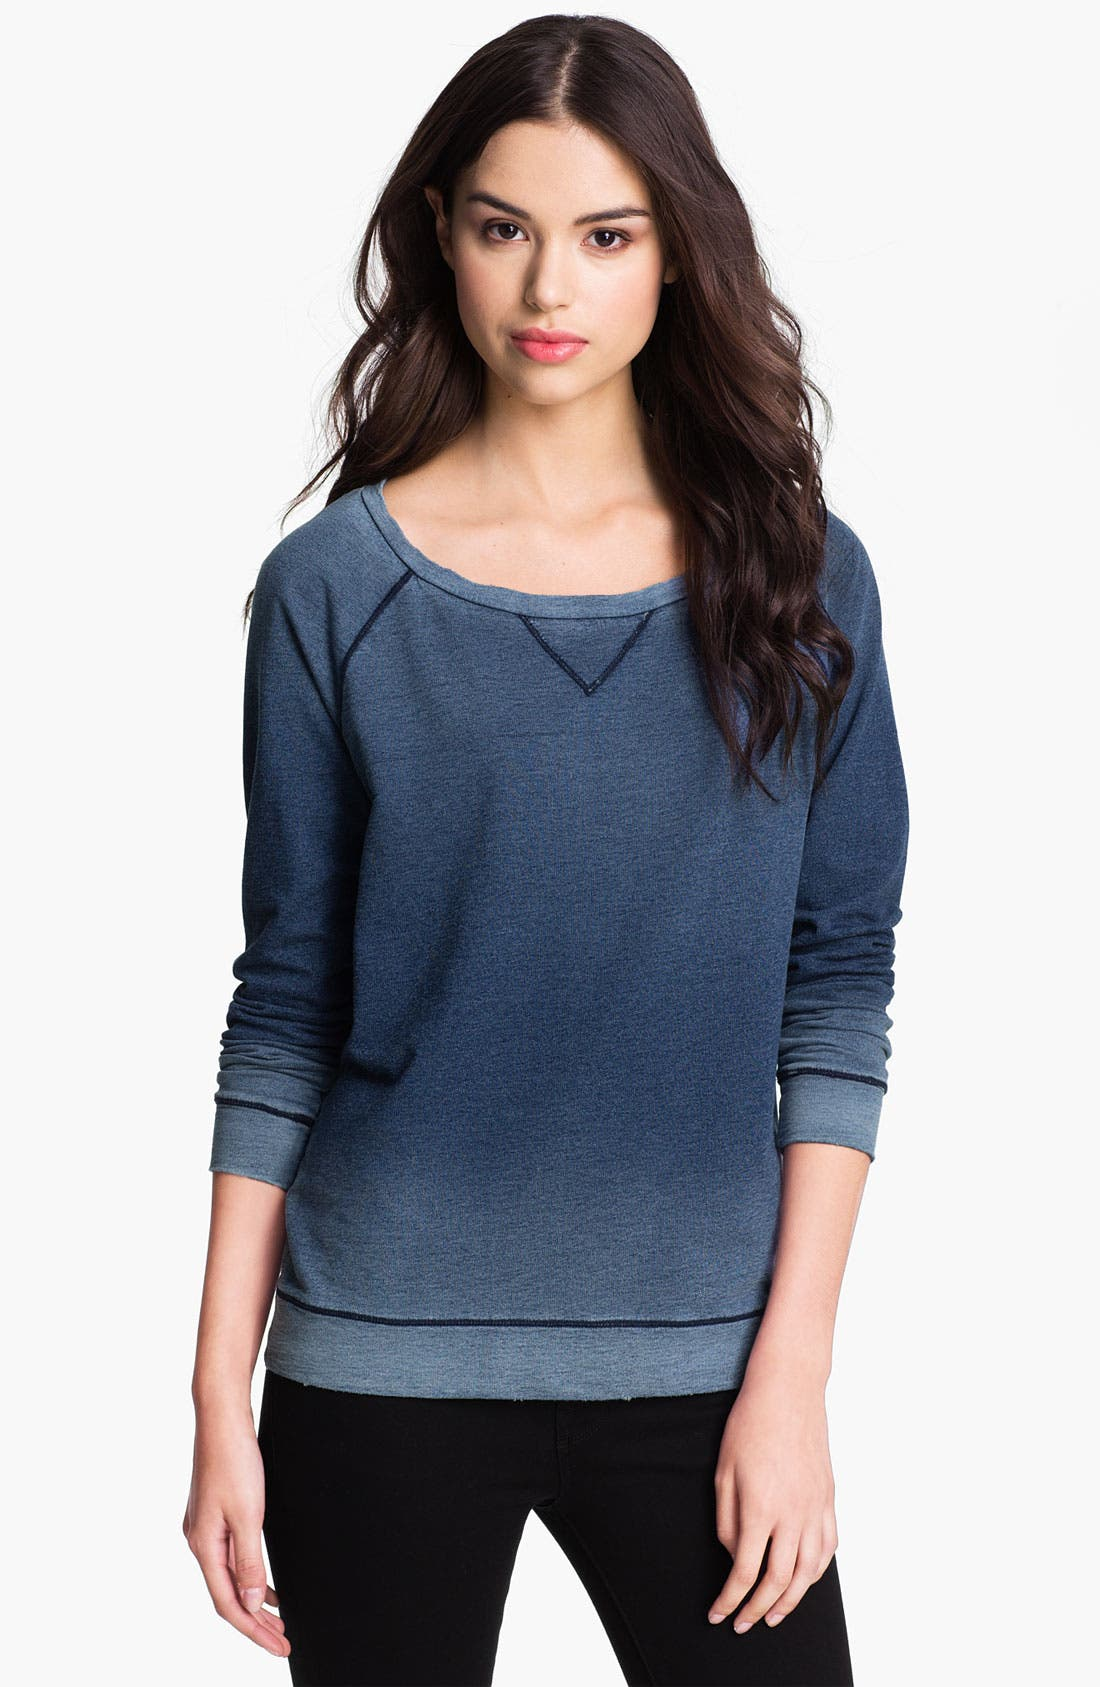 Alternate Image 1 Selected - Soft Joie 'Amity' Ombré Sweatshirt